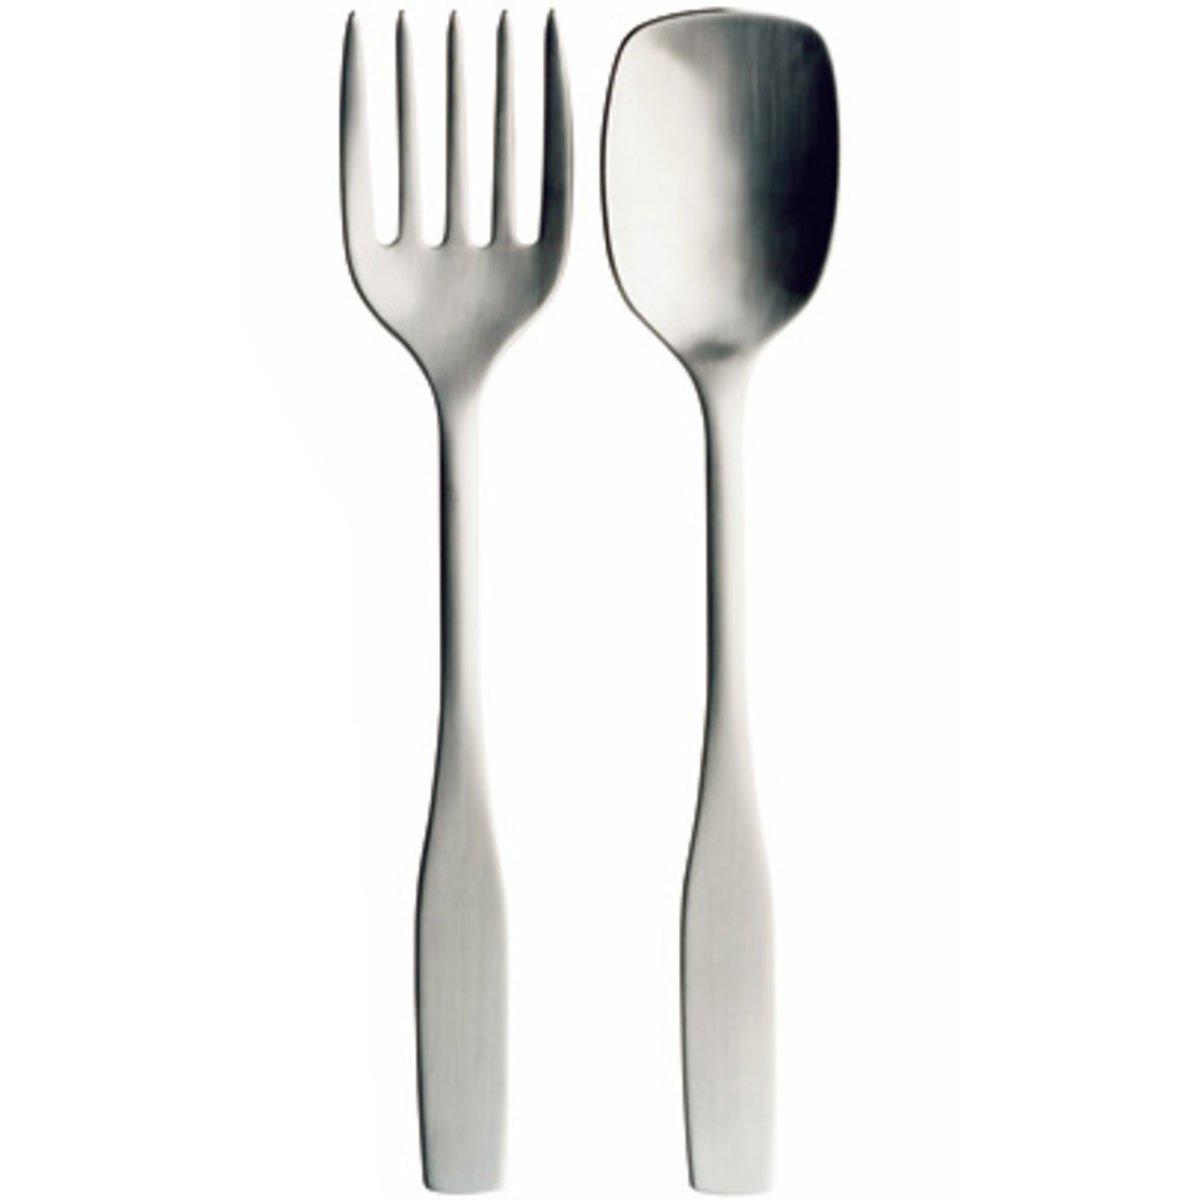 Iittala Citterio 98 Serving Set 15087811 IT187811_Acciaio cutlery contemporary